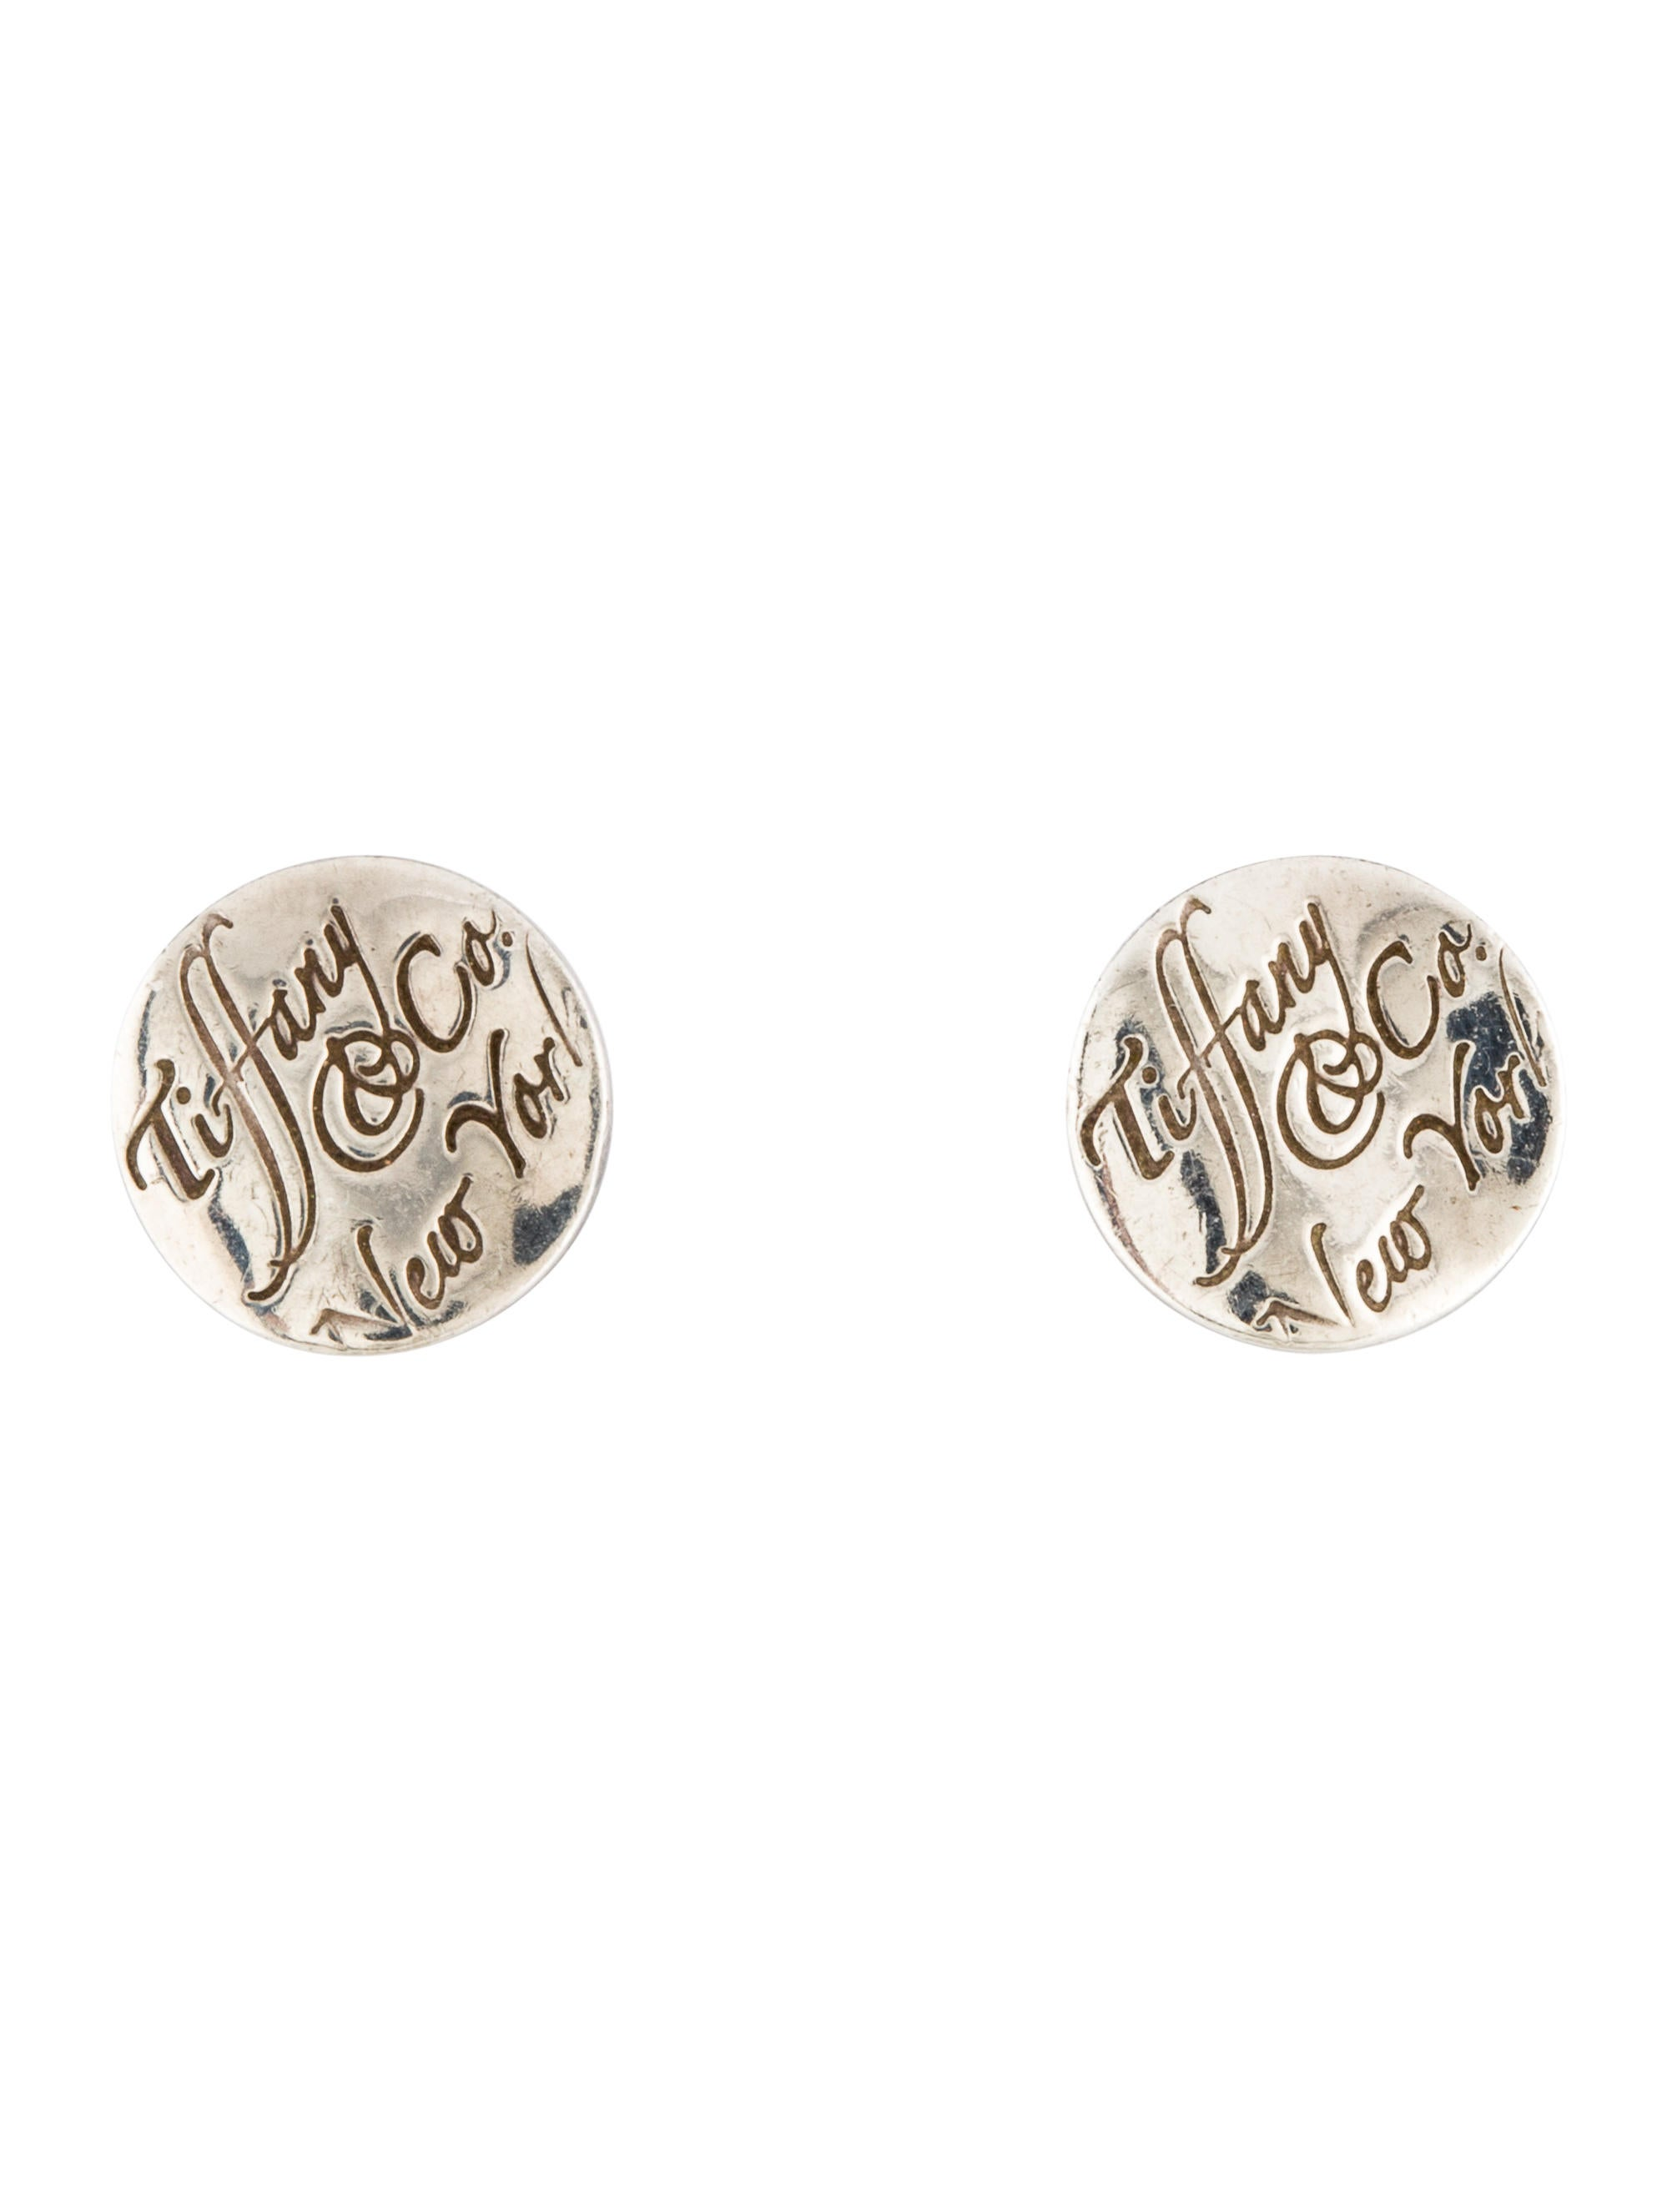 b83ed4271 Tiffany & Co. Tiffany Notes Stud Earrings - Earrings - TIF63443 ...